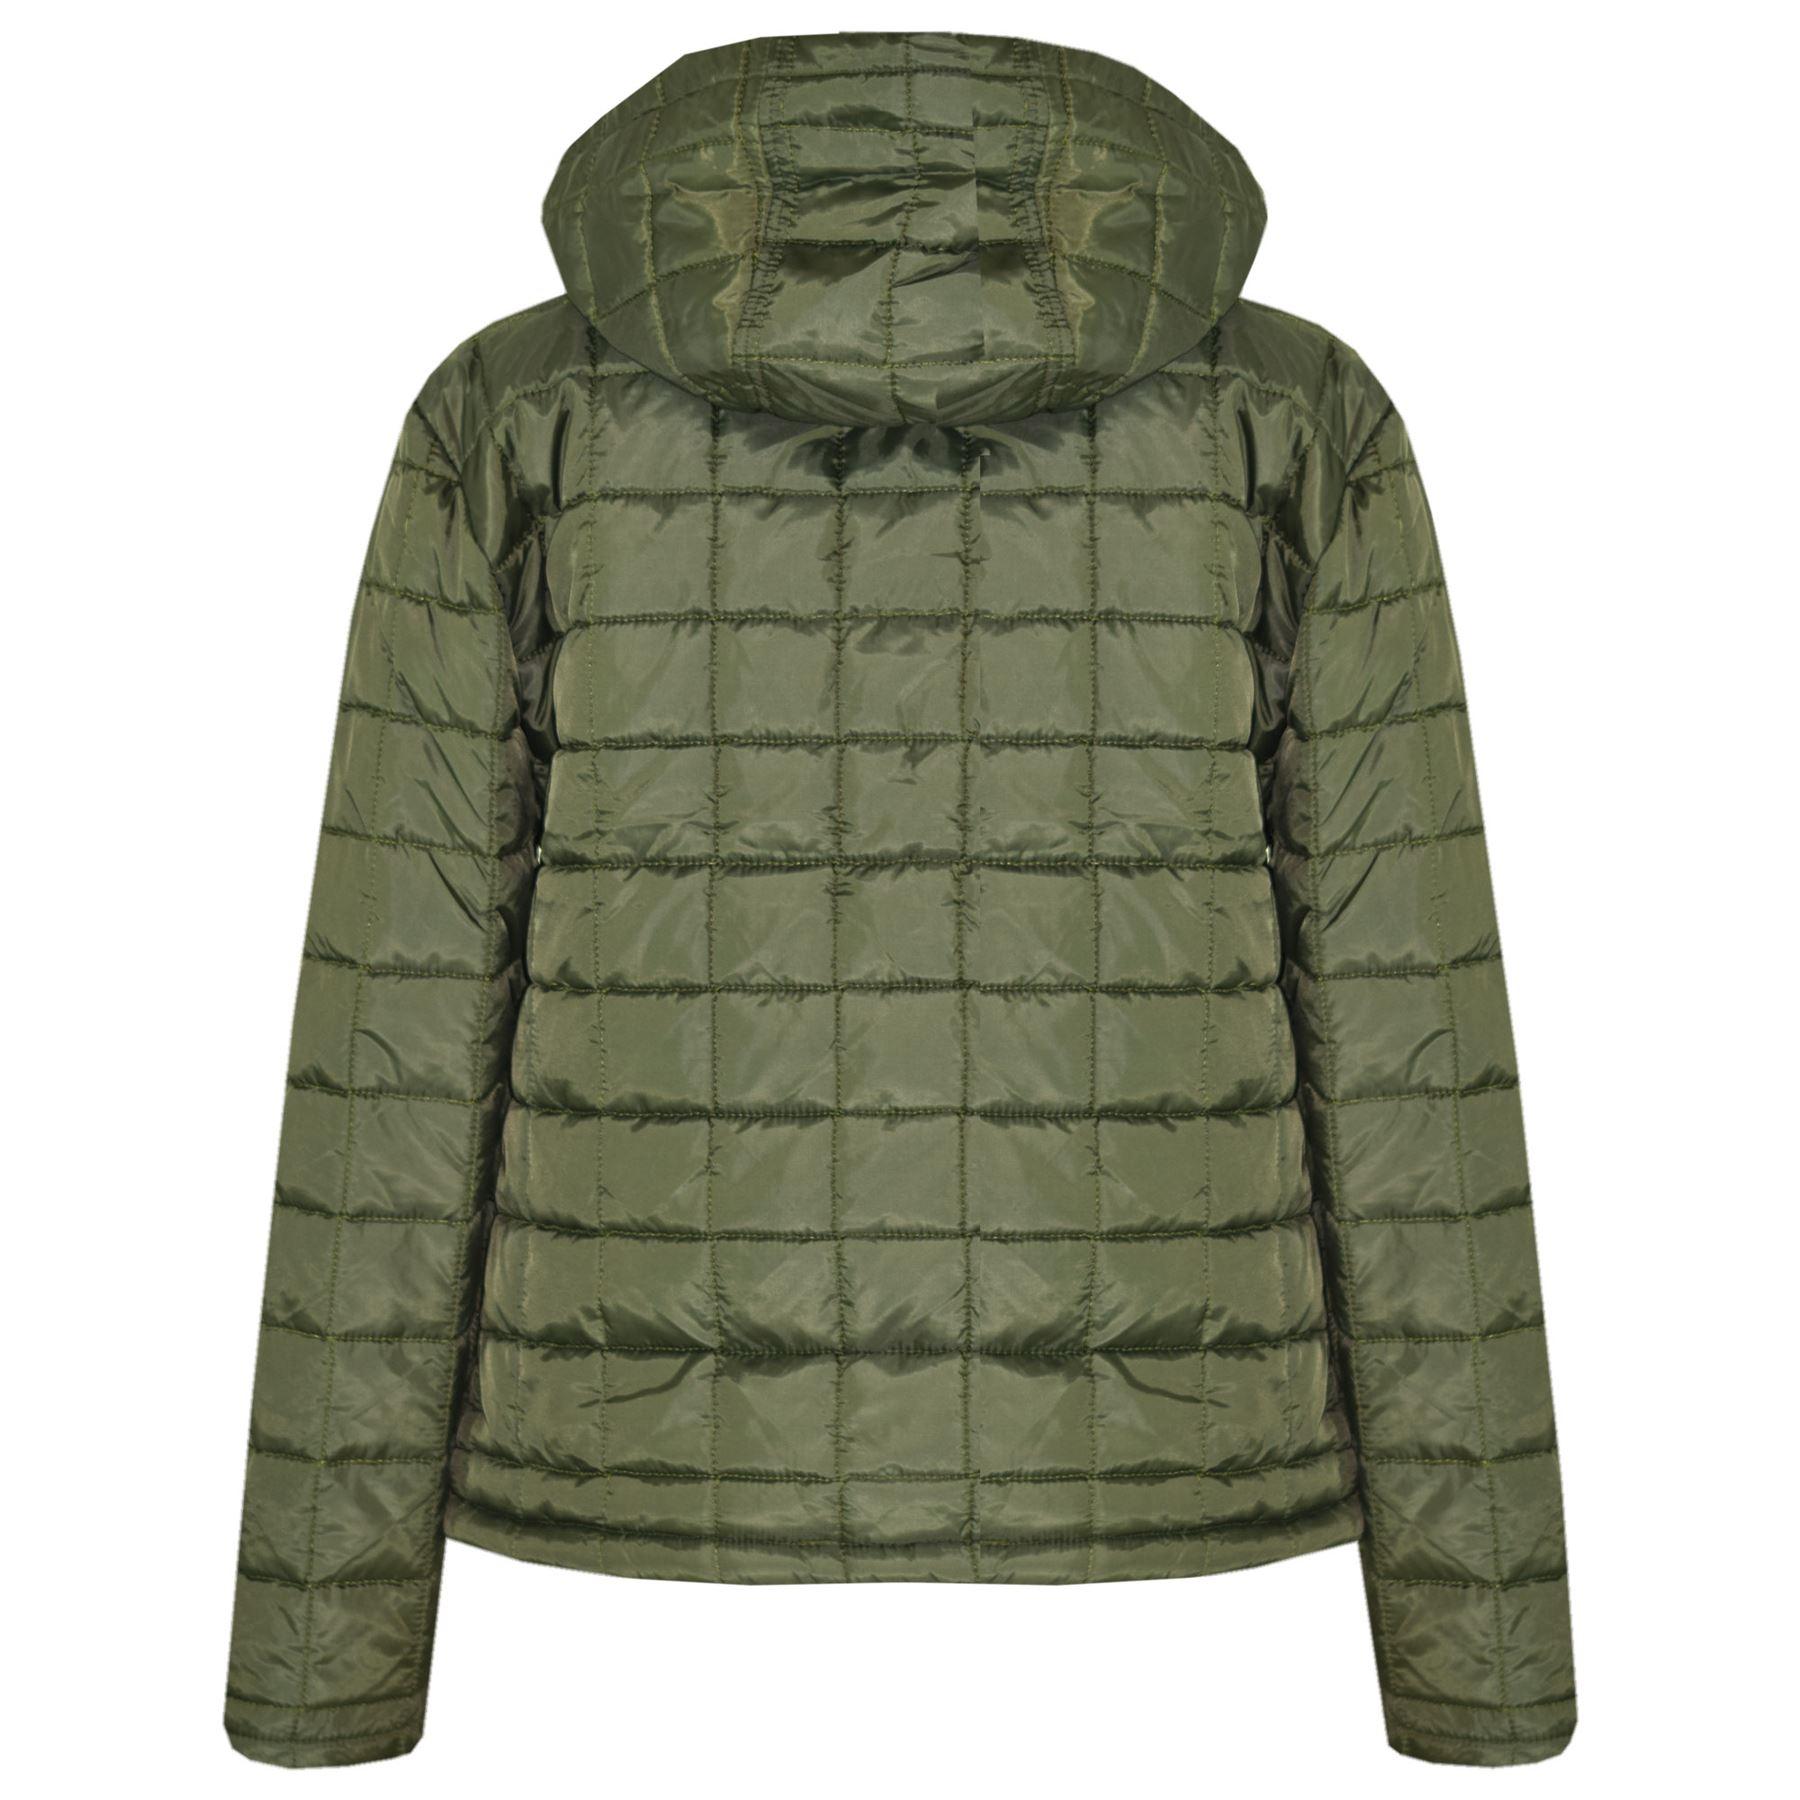 c08fd8f63846 Boys Jackets Kids Designer s Foam Padded Puffa School Warm Thick ...